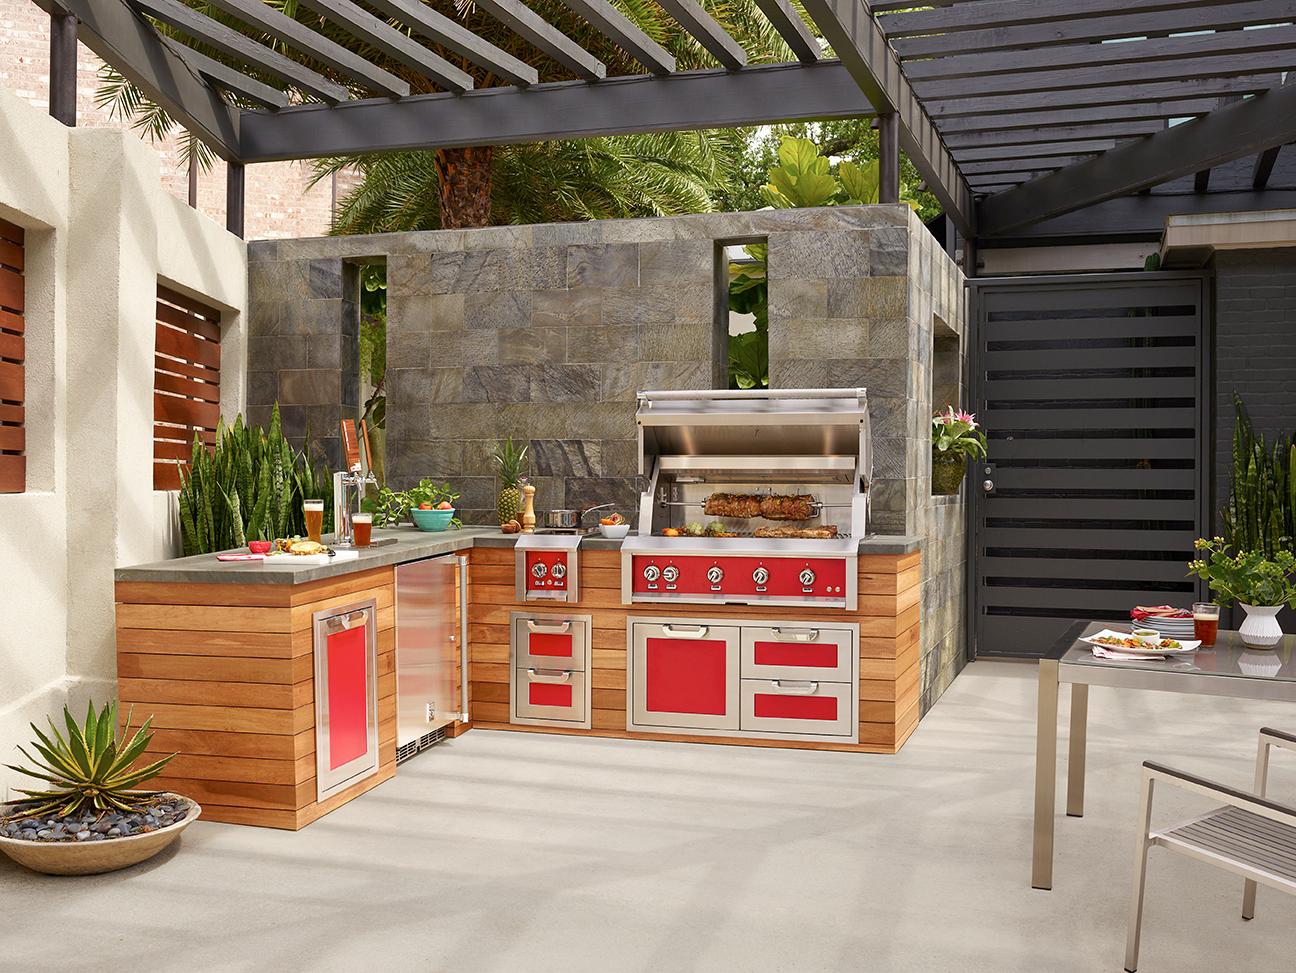 Outdoor Built-in Kitchen_Matador_Glam_(RGB).jpg